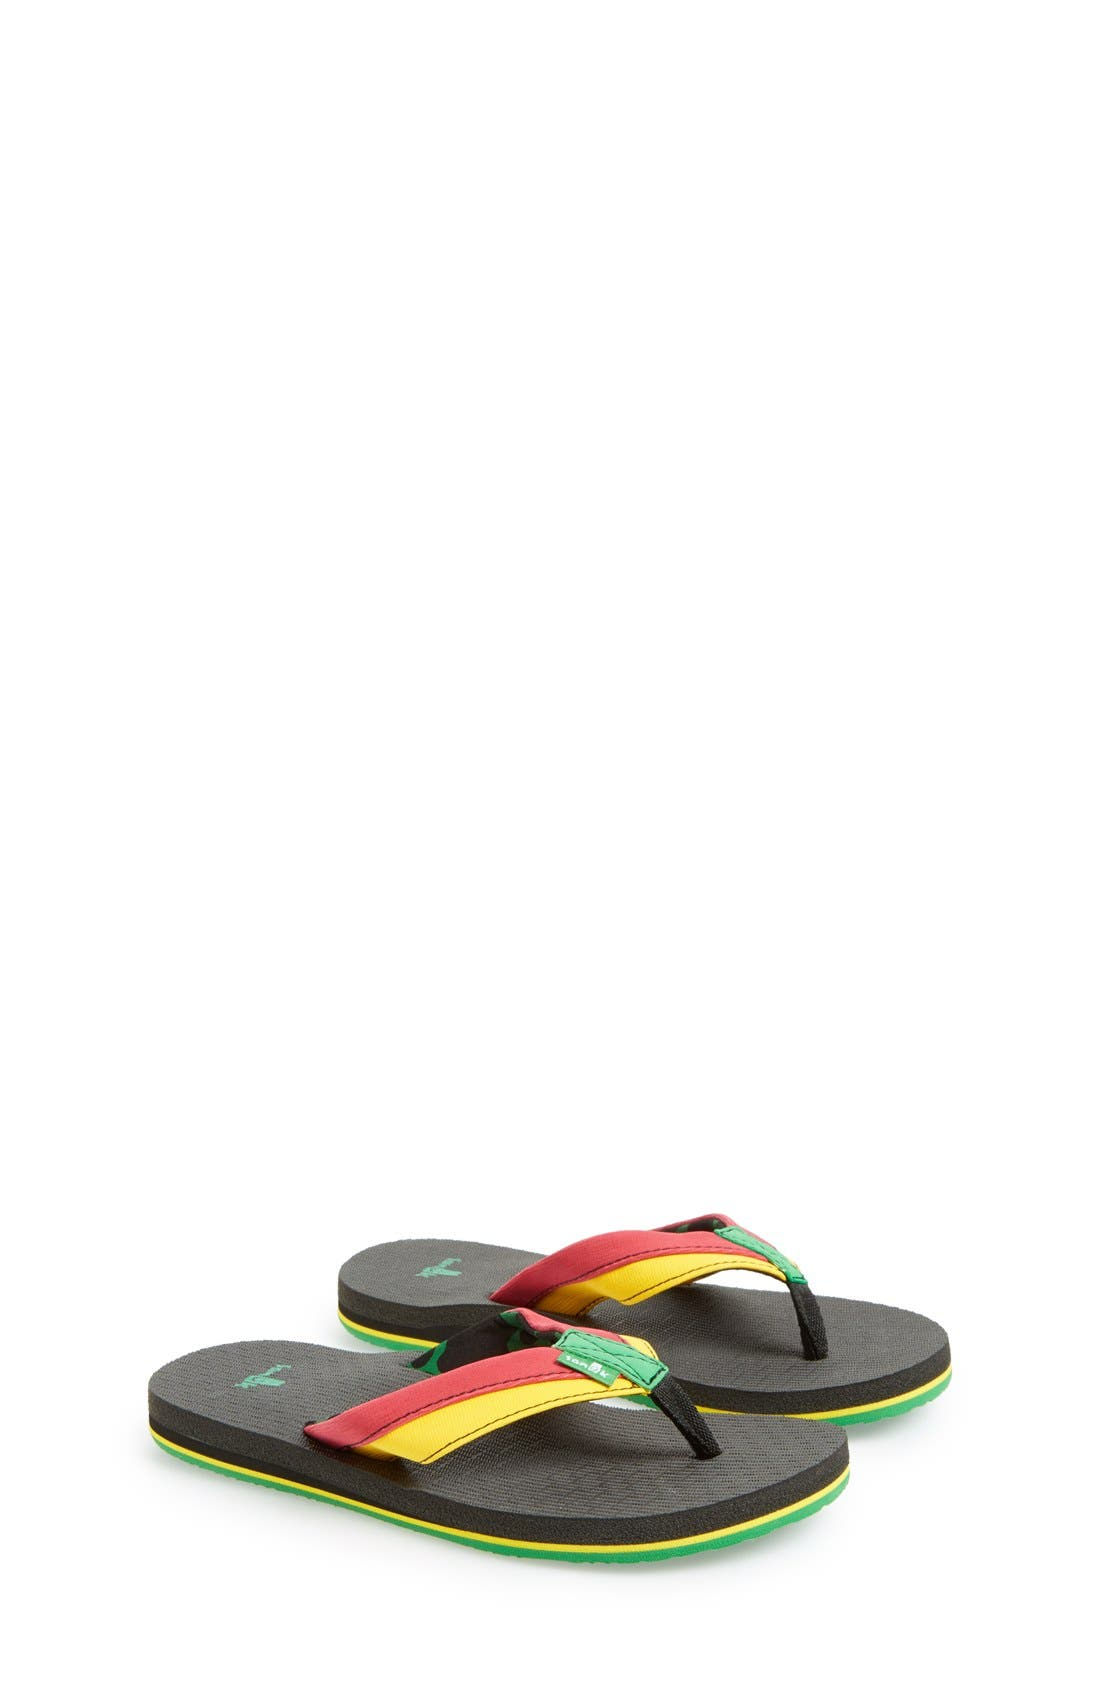 'Rootbeer Cozy' Lightweight Flip Flop Sandal,                             Main thumbnail 6, color,